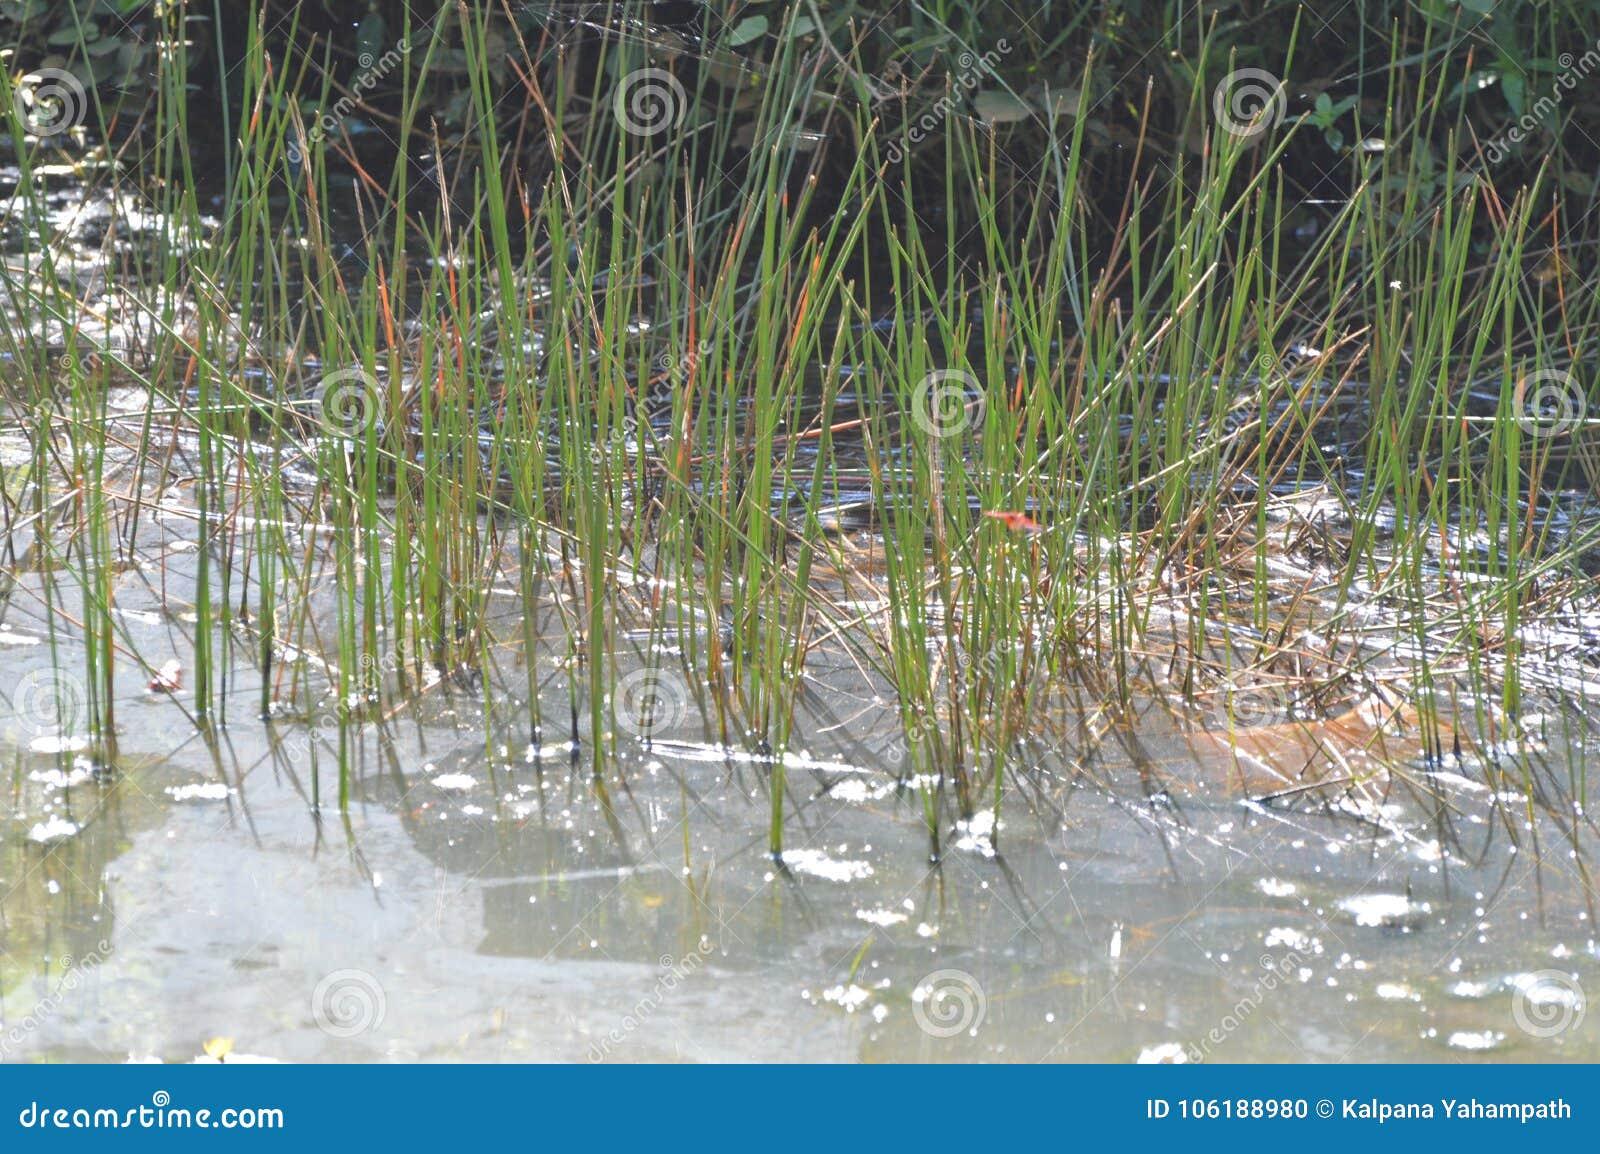 Charca en tierra mojada